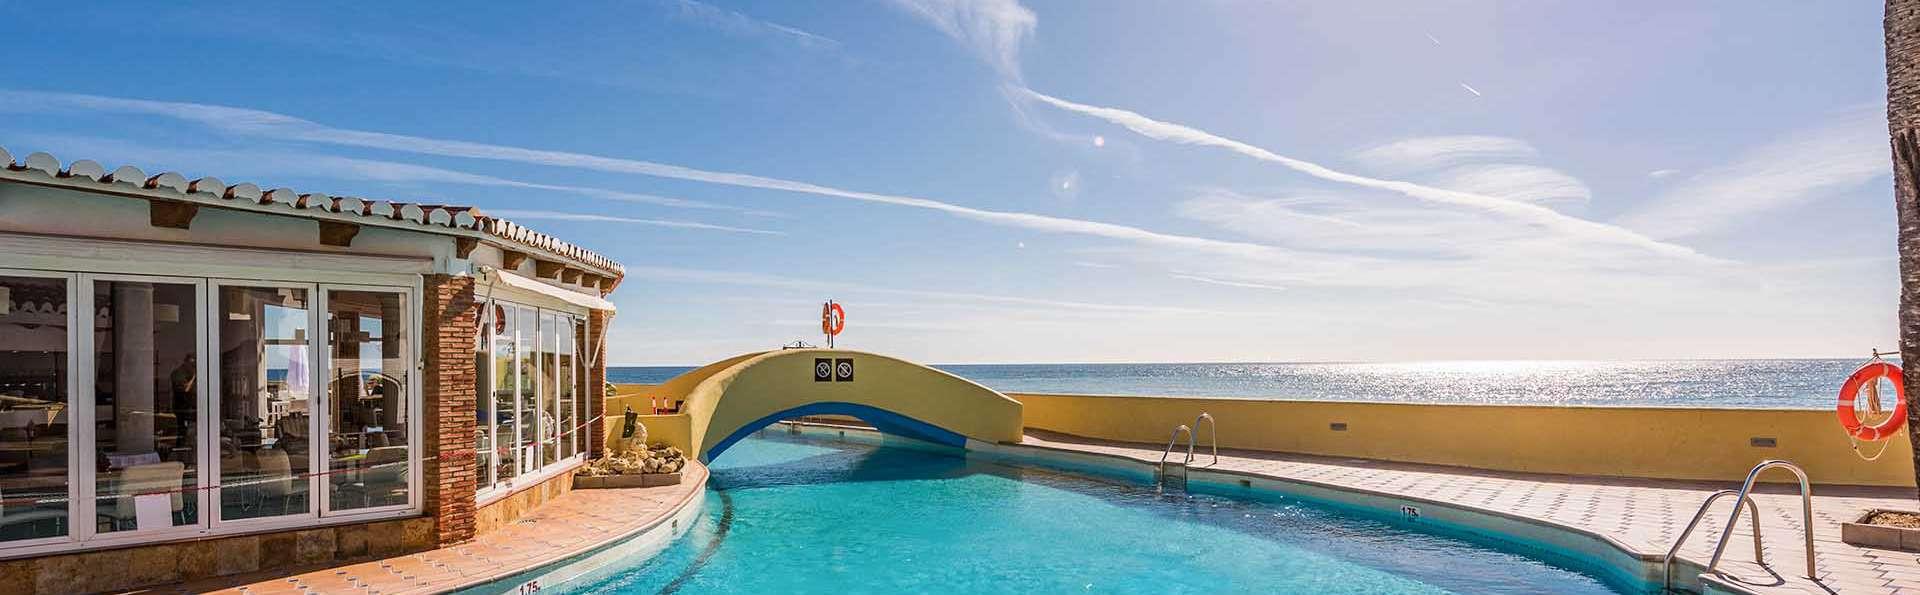 Macdonald Doña Lola Resort - EDIT_Pool___Boardwalk_01.jpg